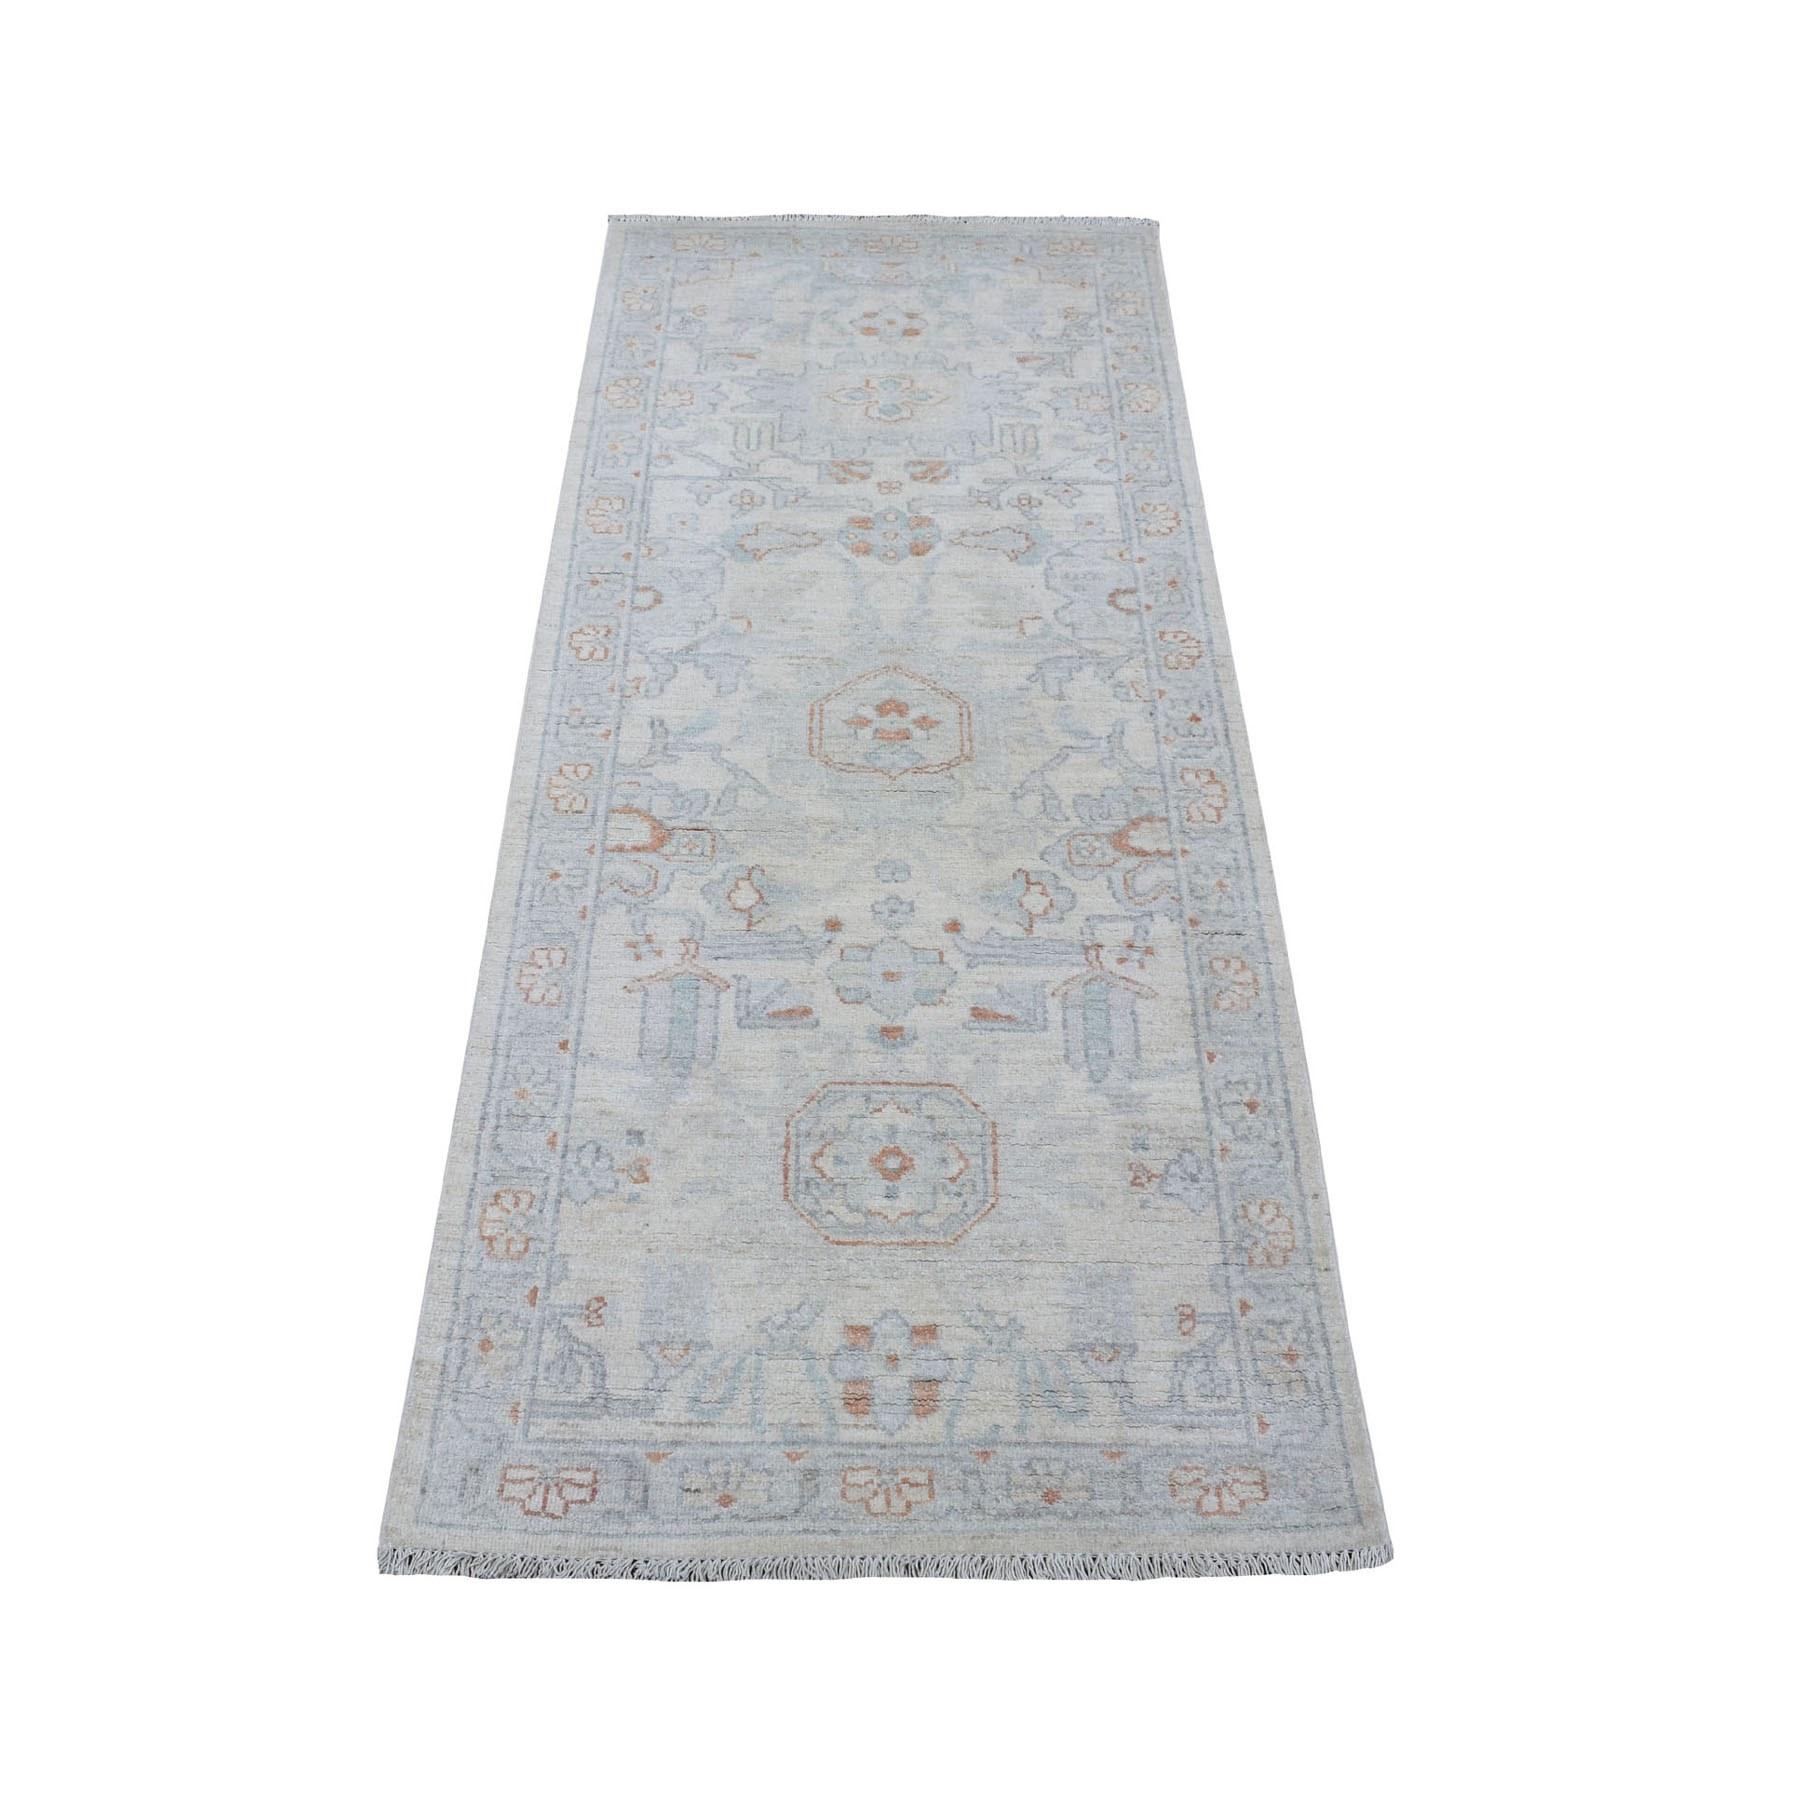 "2'5""X5'10"" White Wash Peshawar Organic Wool Hand Knotted Runner Oriental Rug moaeeac7"